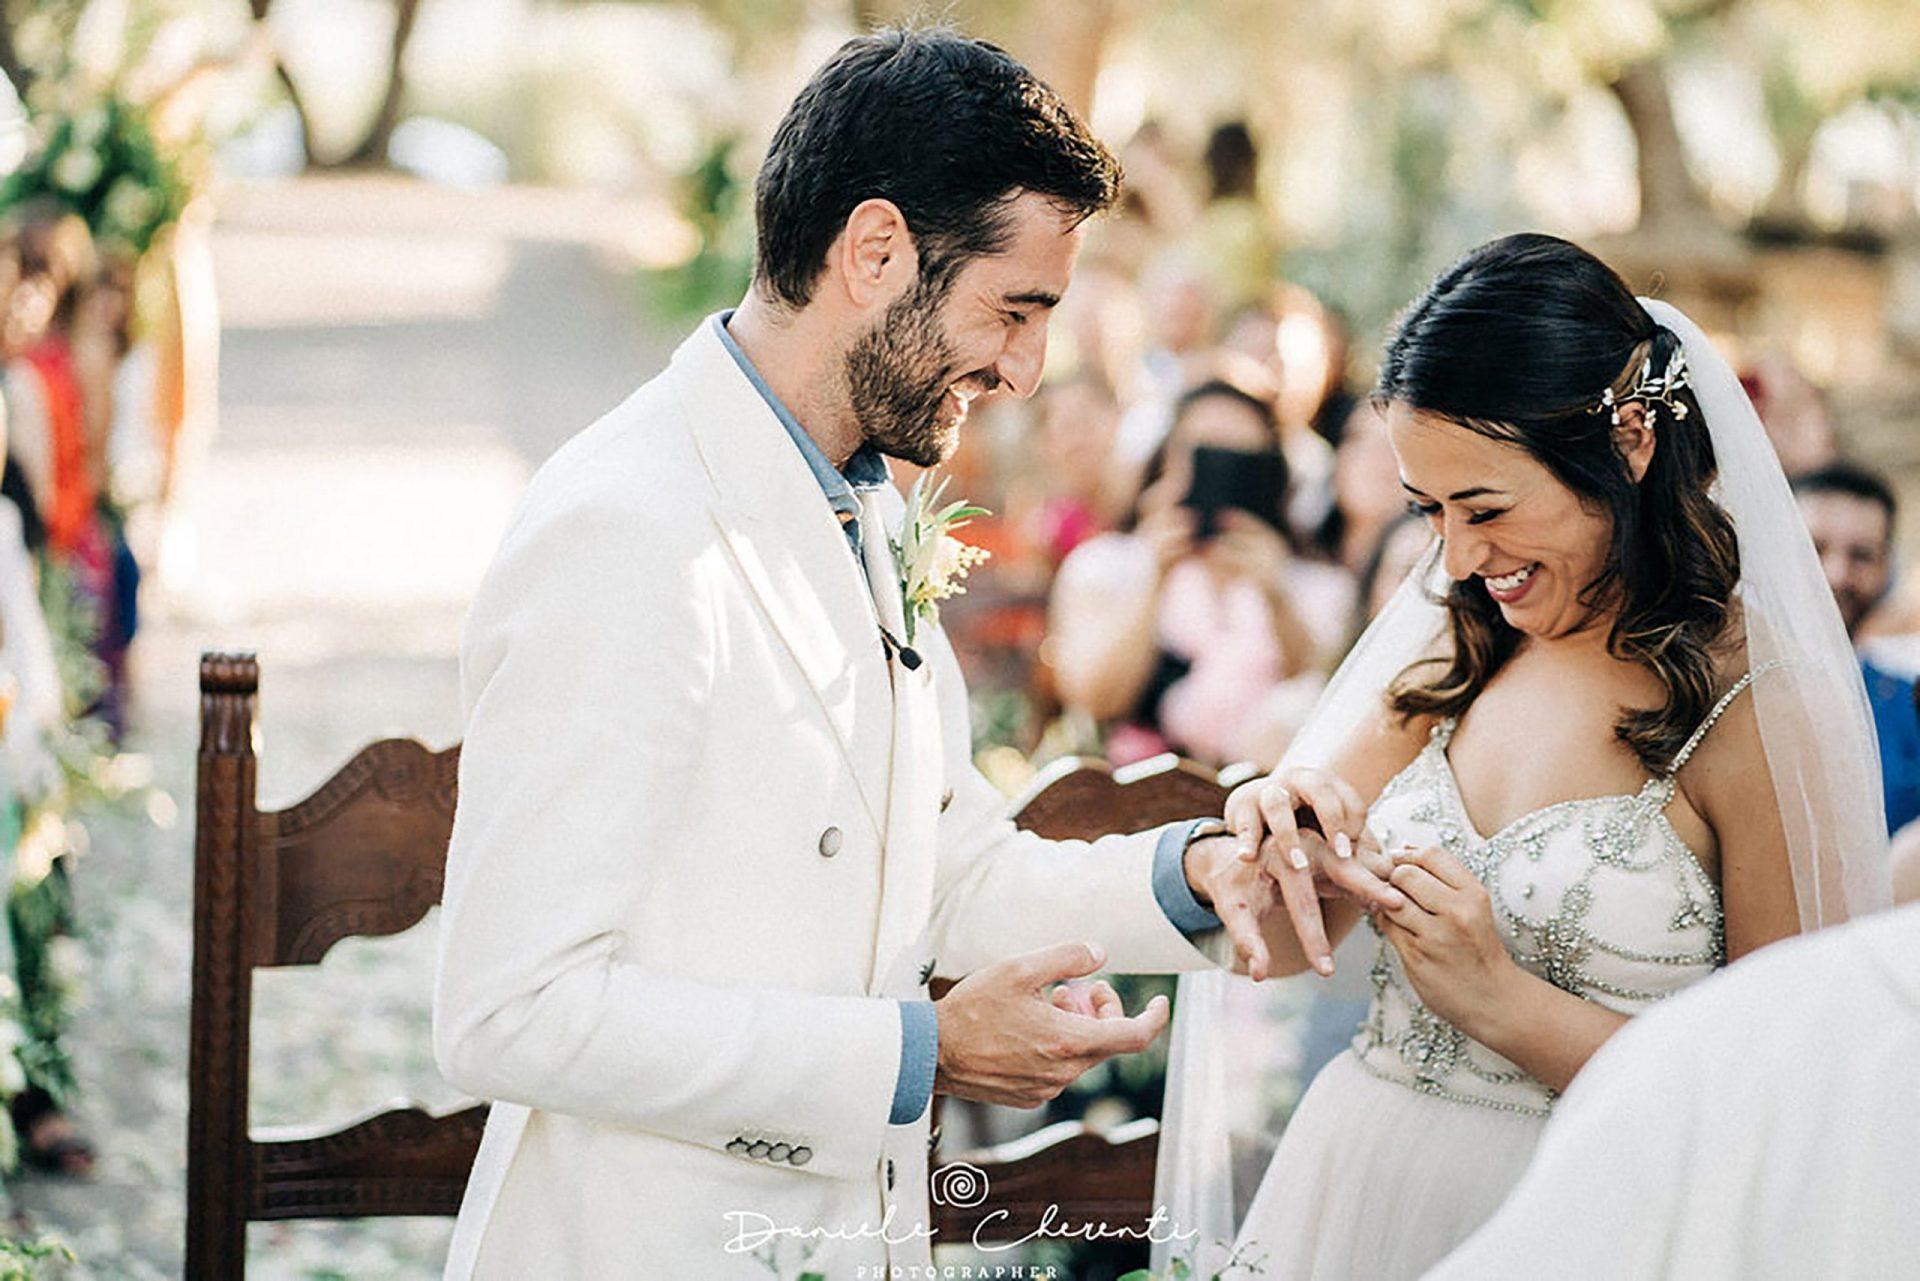 Marianna & Matteo, the wedding rings exchange